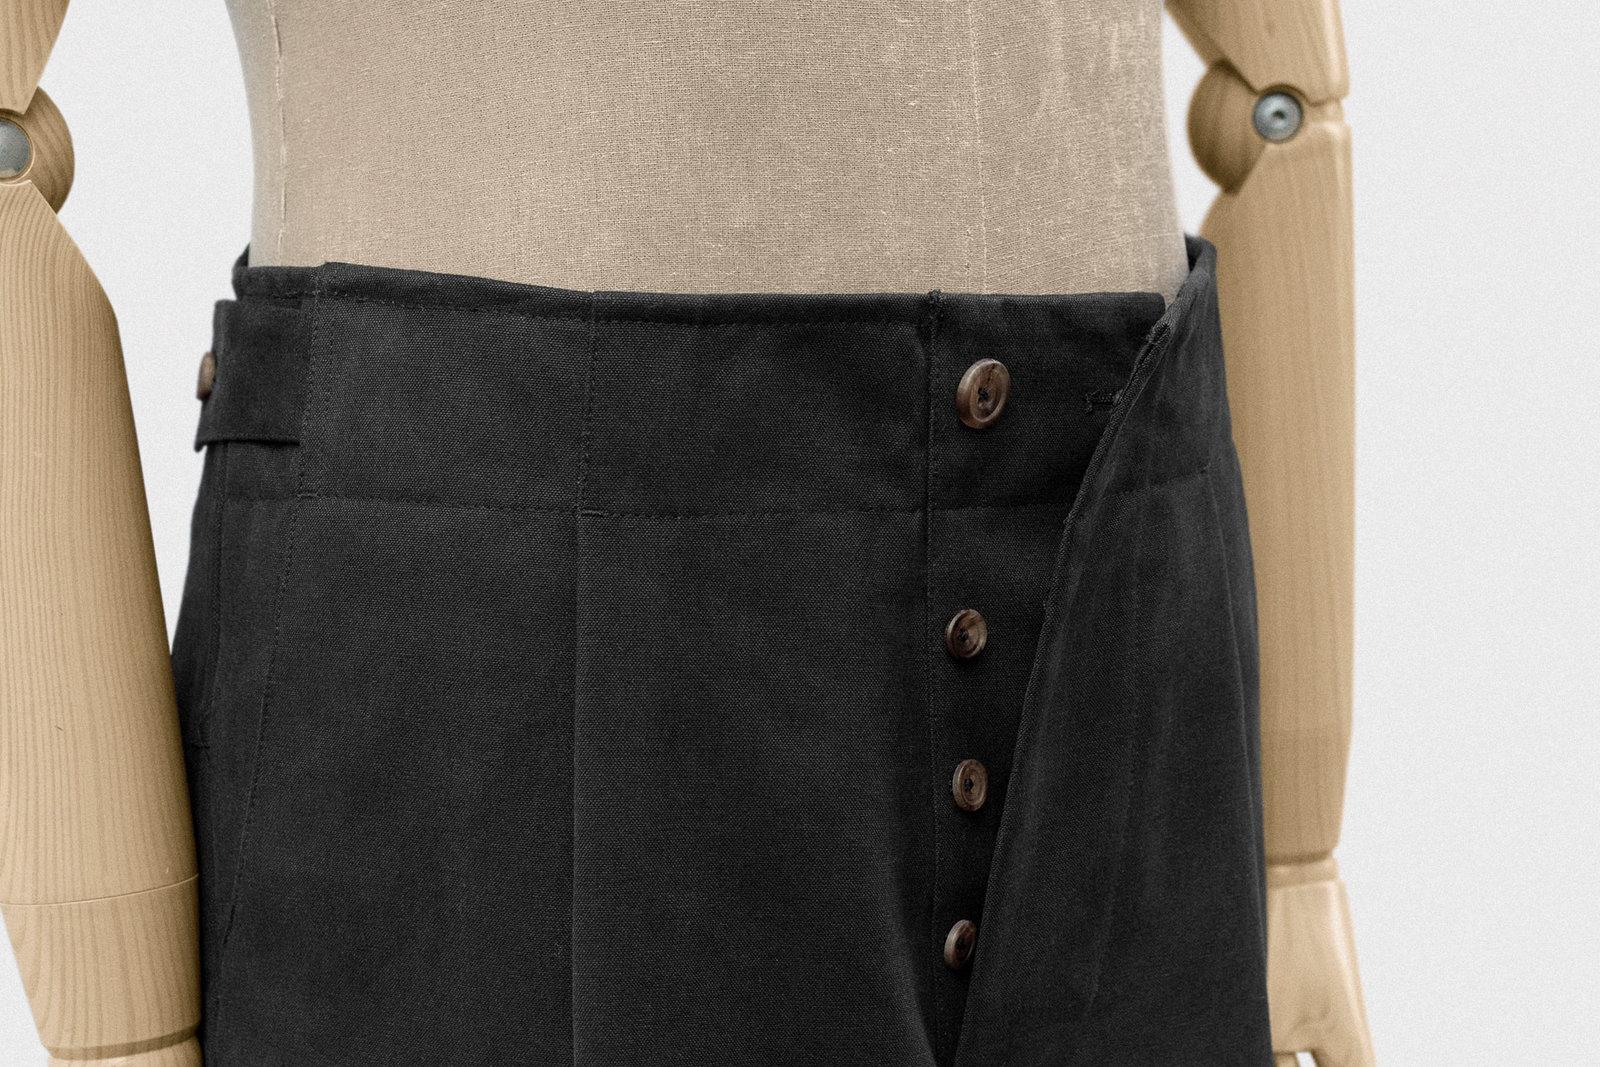 field-trousers-cotton-black-6@2x.jpeg